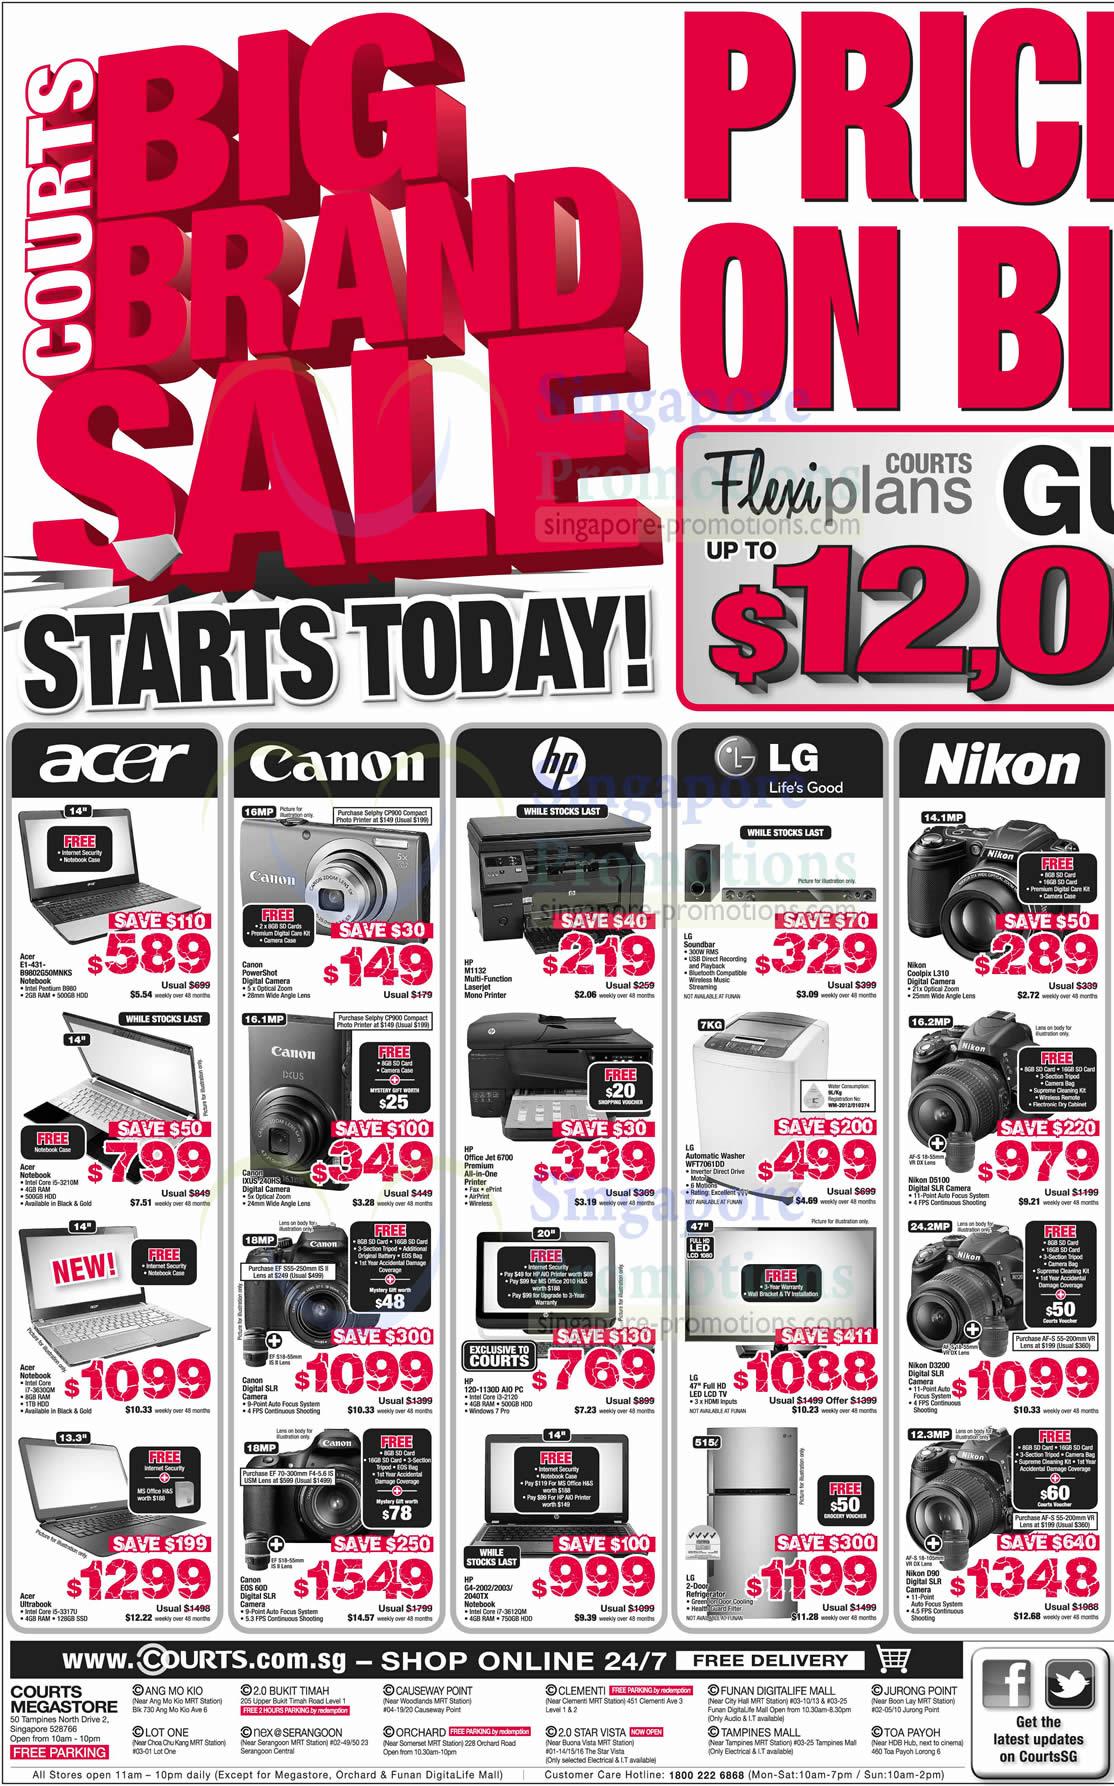 Acer E1-431-B9802G50MNKS Notebook, Canon IXUS 240HS Digital Camera, Canon EOS 60D SLR Digital Camera, HP LaserJet Pro M1132 Printer, HP OfficeJet 6700 Printer, HP 120-1130D AIO Desktop PC, HP G4-2002Notebook, HP G4-2003 Notebook, HP G4-2040TX Notebook, Nikon Coolpix L310 Digital Camera, LG WFT7061DD Washer, Nikon D5100 DSLR Digital Camera, Nikon D3200 DSLR Digital Camera, Nikon D90 DSLR Digital Camera, Sony NEX-5N Digital Camera